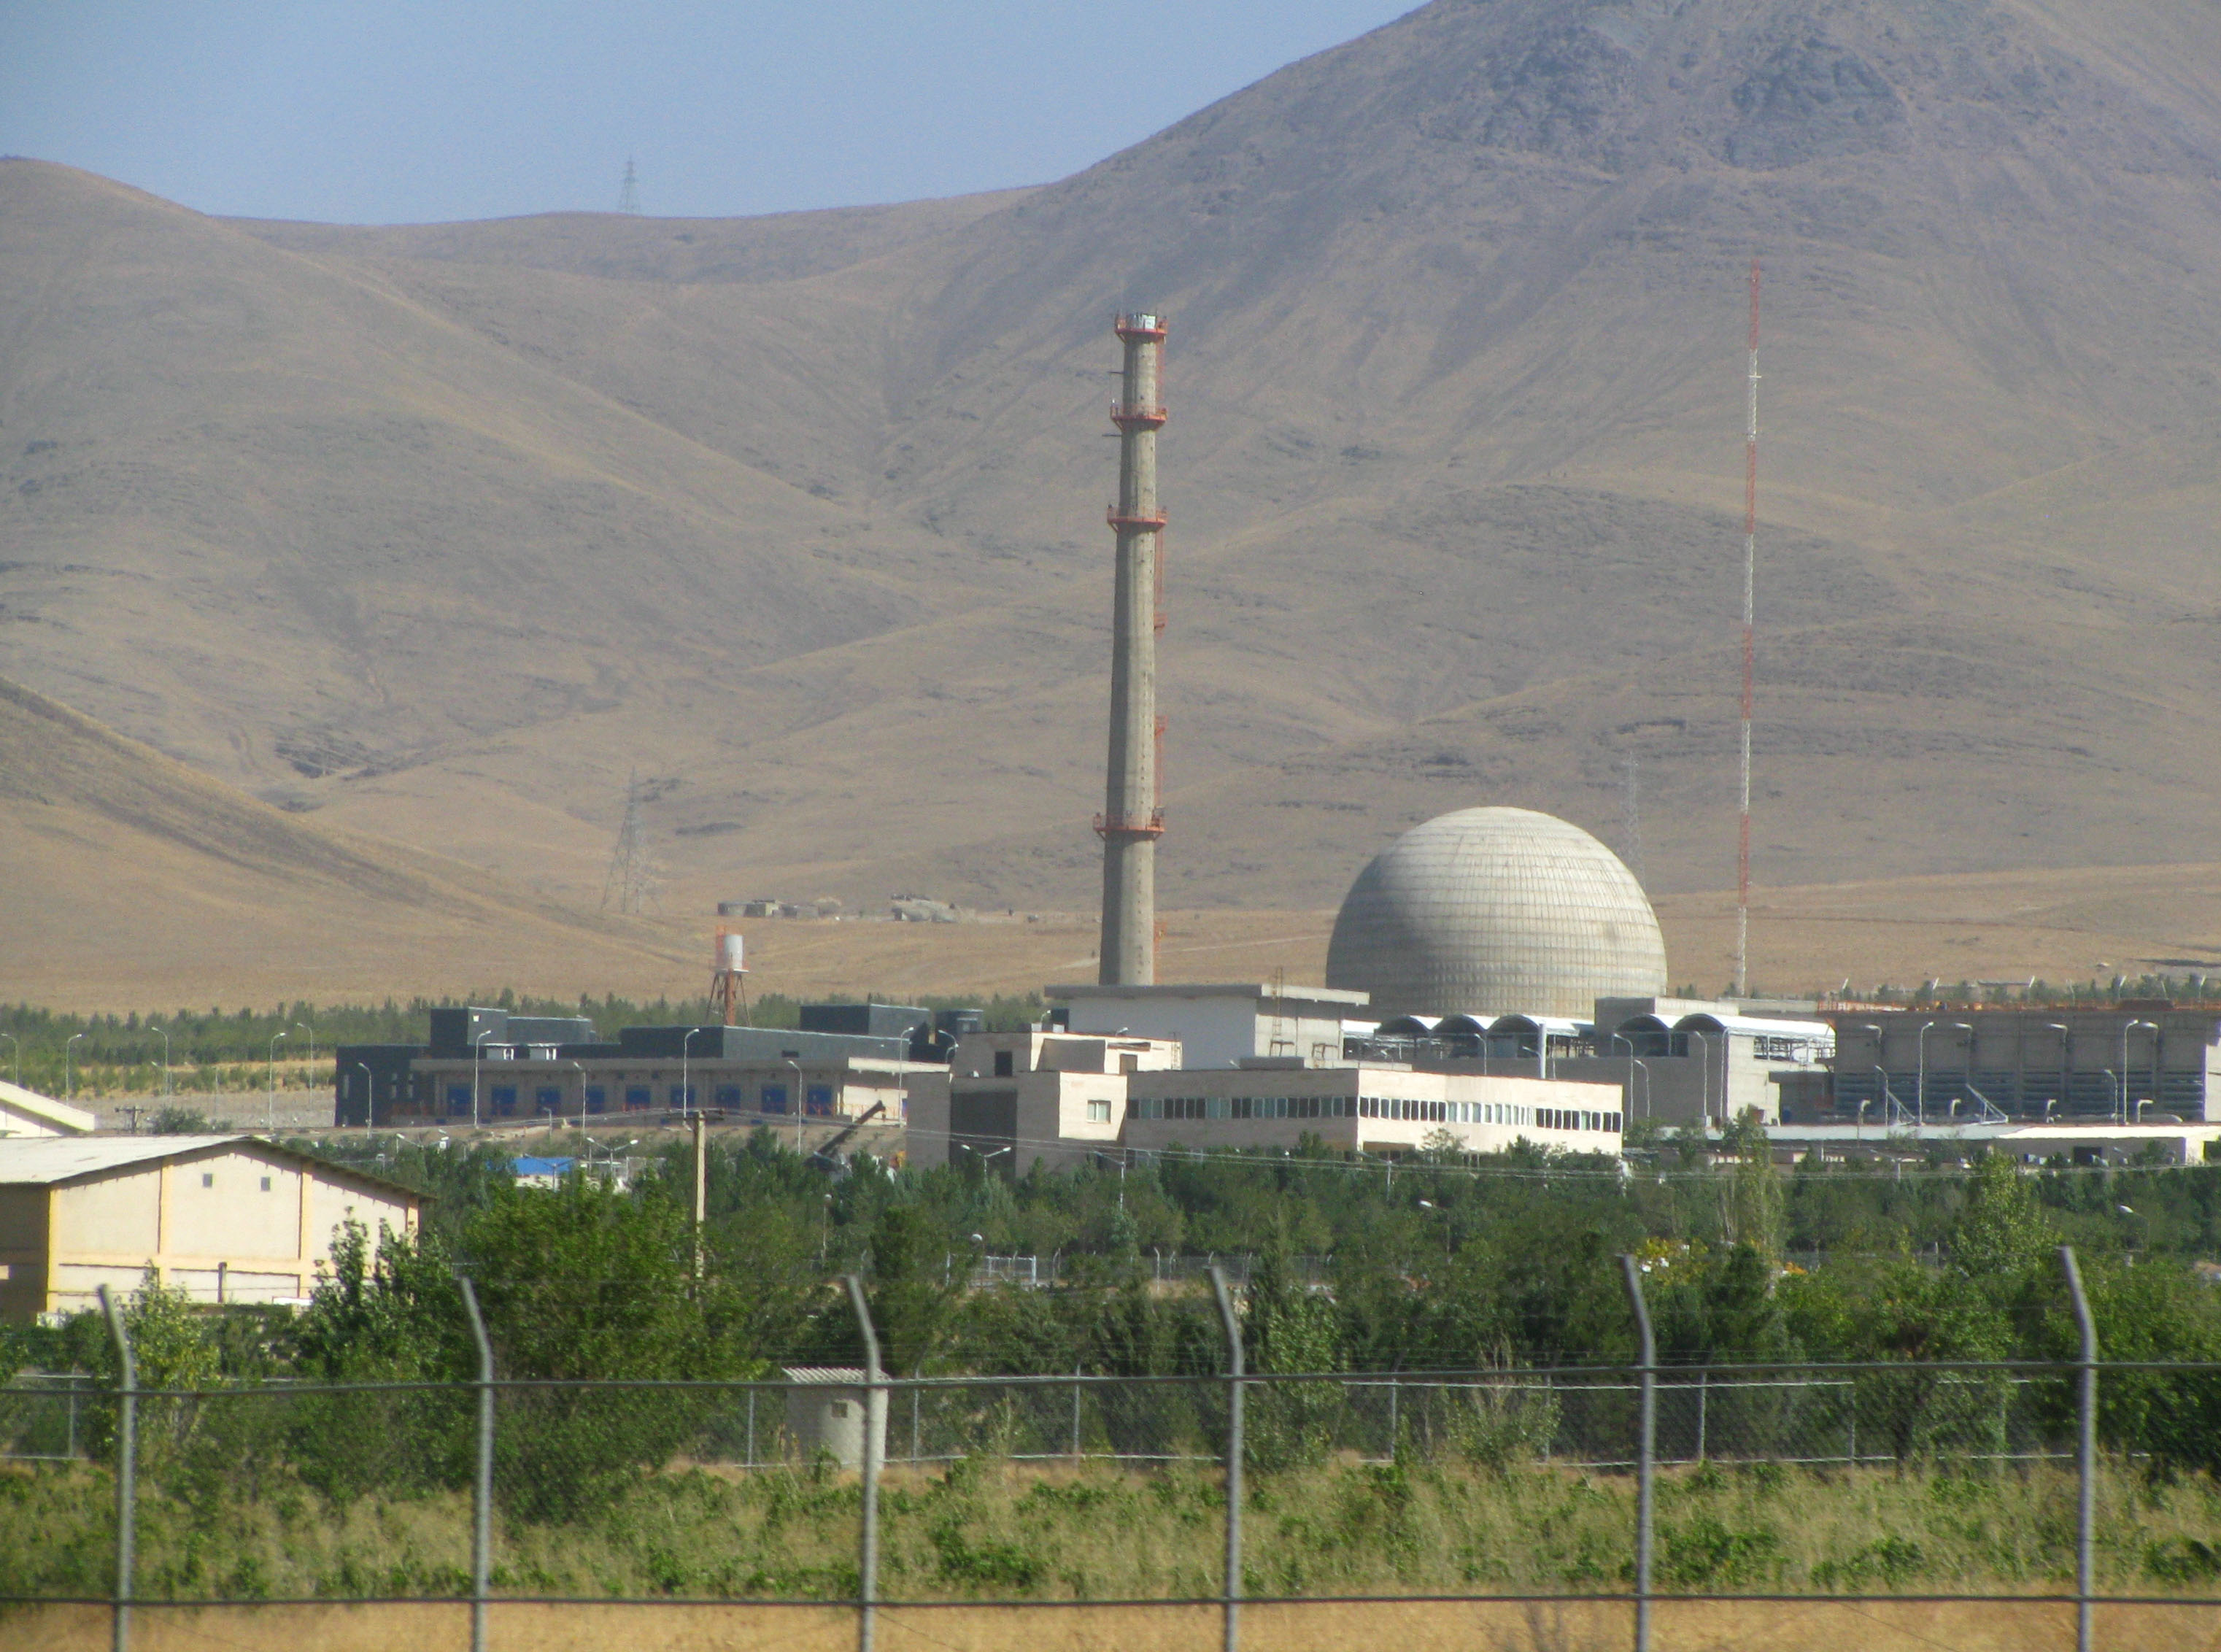 Risultati immagini per لو رفتن برنامه هسته ای ایران 2003